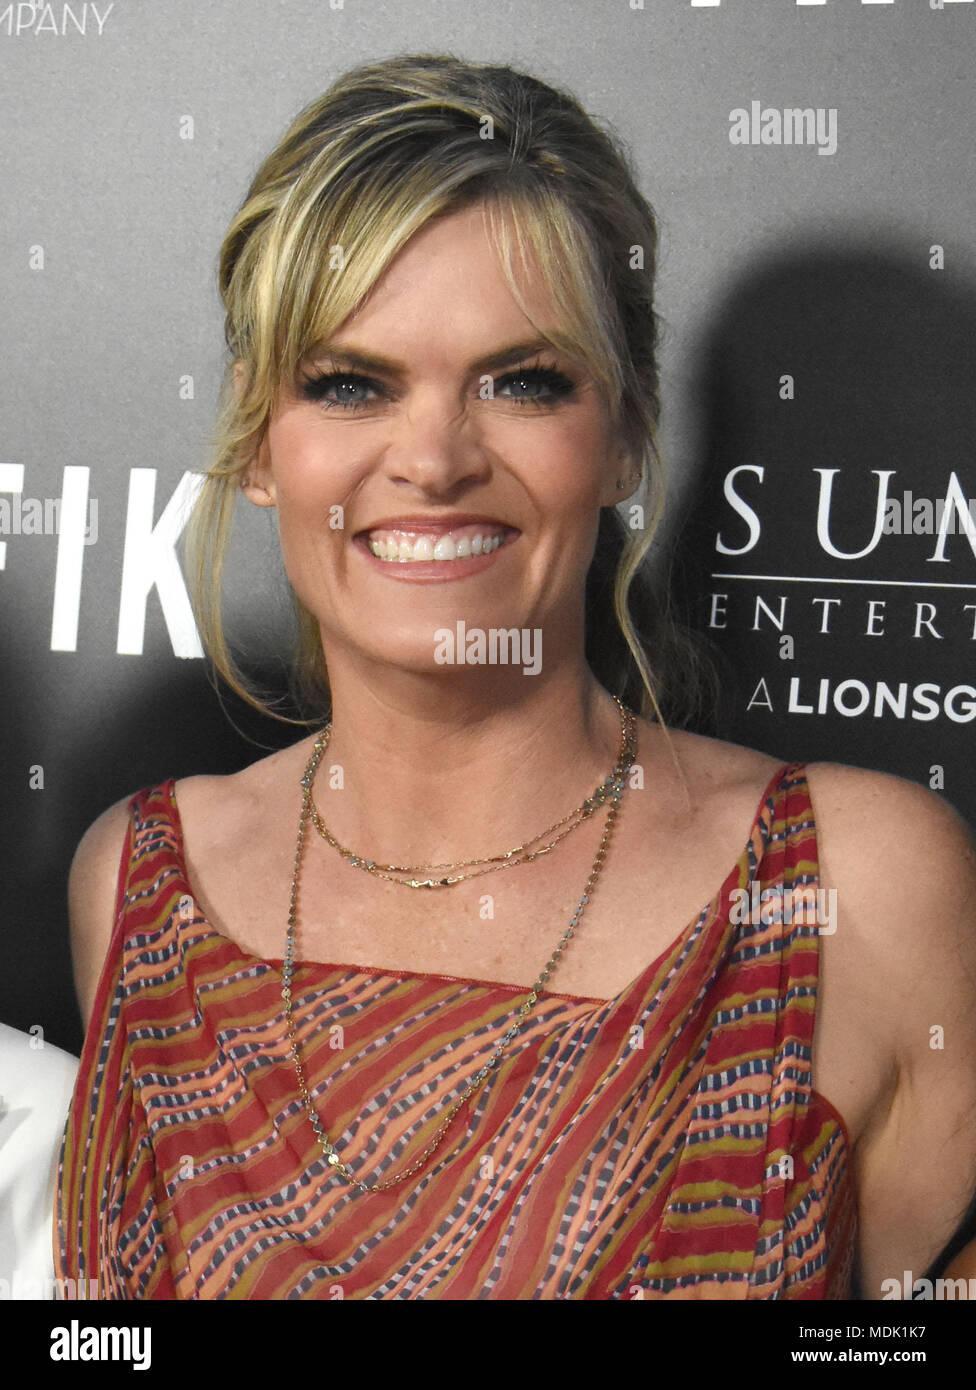 Hattie McDaniel,Ricci Harnett (born 1973) Porno video Melba Moore,42. Carrie Underwood